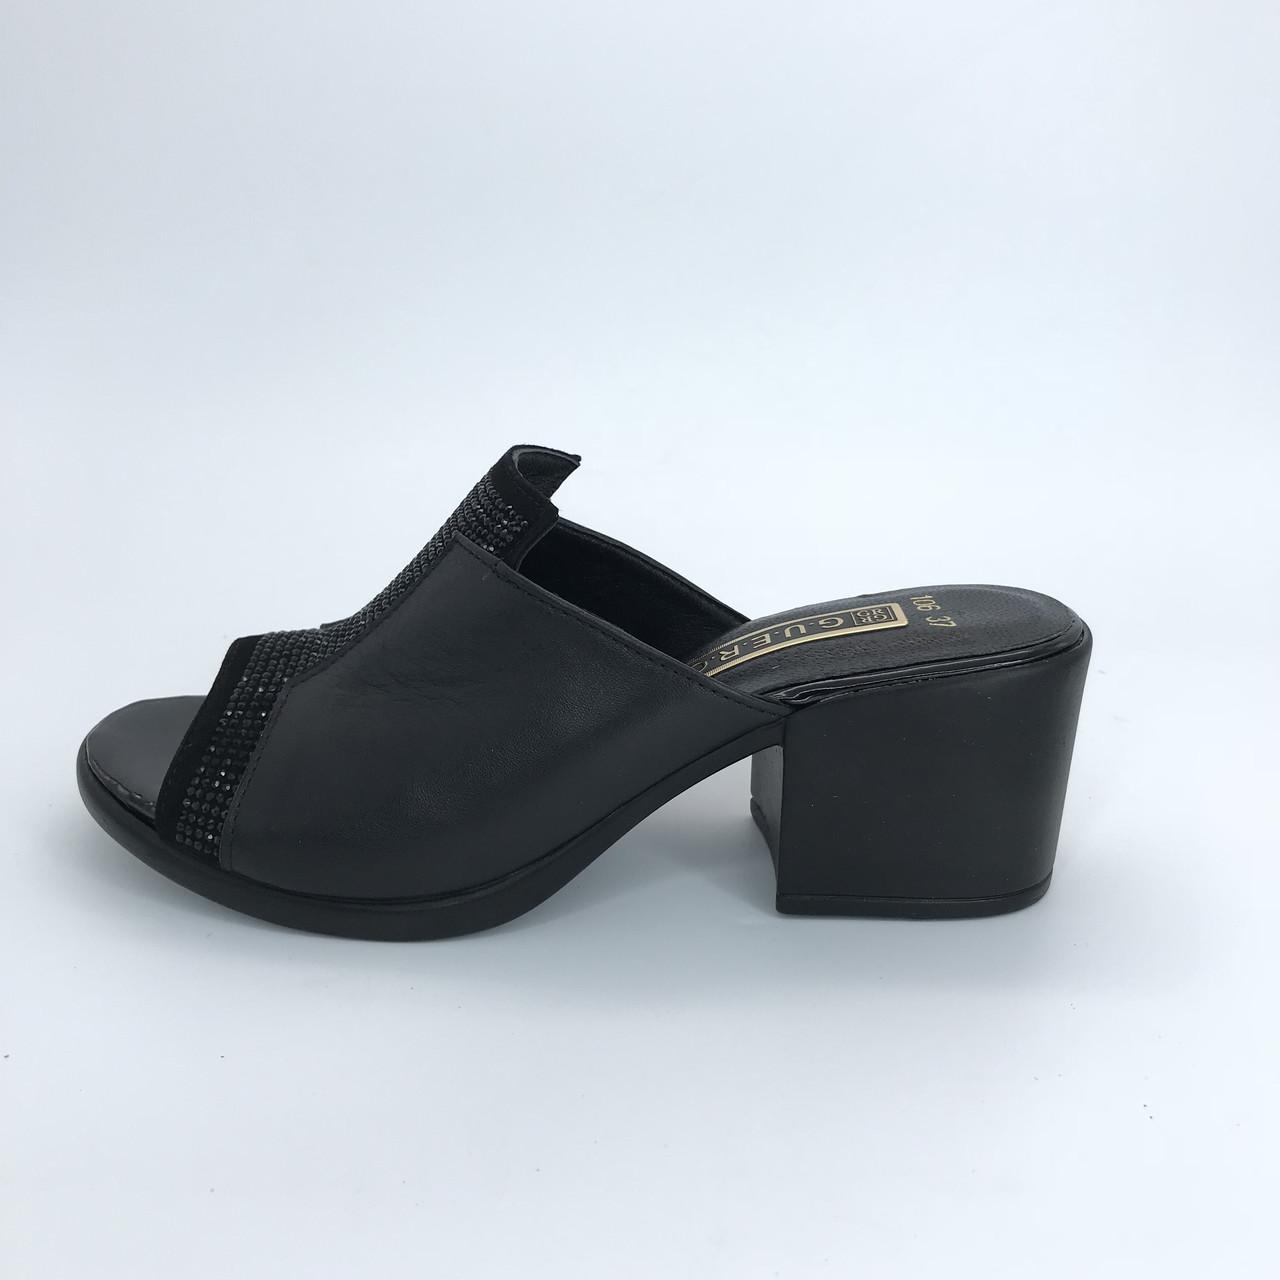 561223d43 Шлепки женские на каблуке: продажа, цена в Украине. сандалии ...